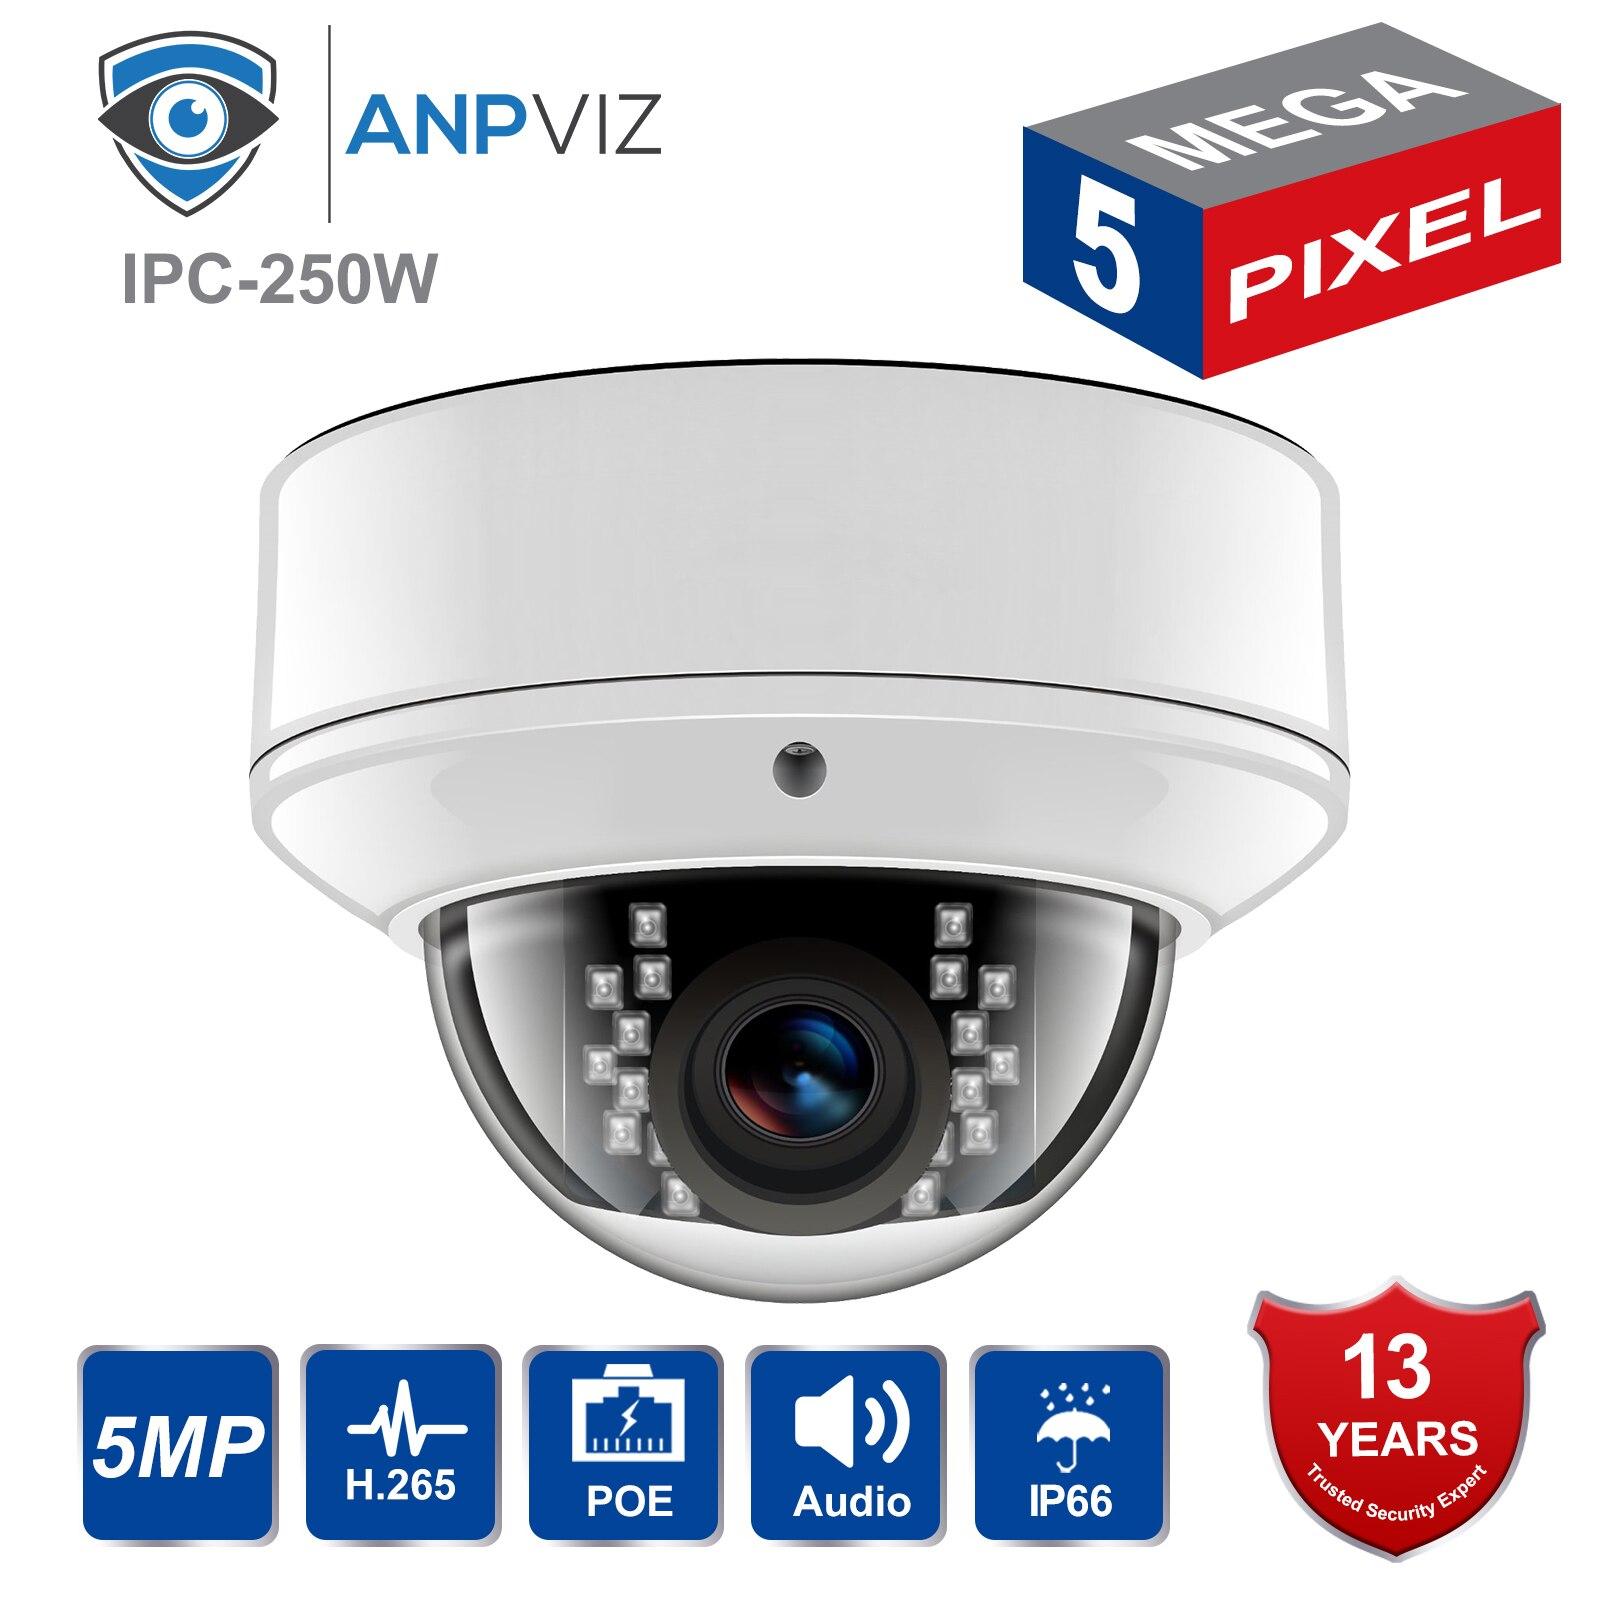 Anpviz H.265 PoE IP Camera IPC-D250W-S 5MP HD Outdoor Waterproof IR30m Night Vision Audio Dome Security Video Surveillance CamAnpviz H.265 PoE IP Camera IPC-D250W-S 5MP HD Outdoor Waterproof IR30m Night Vision Audio Dome Security Video Surveillance Cam